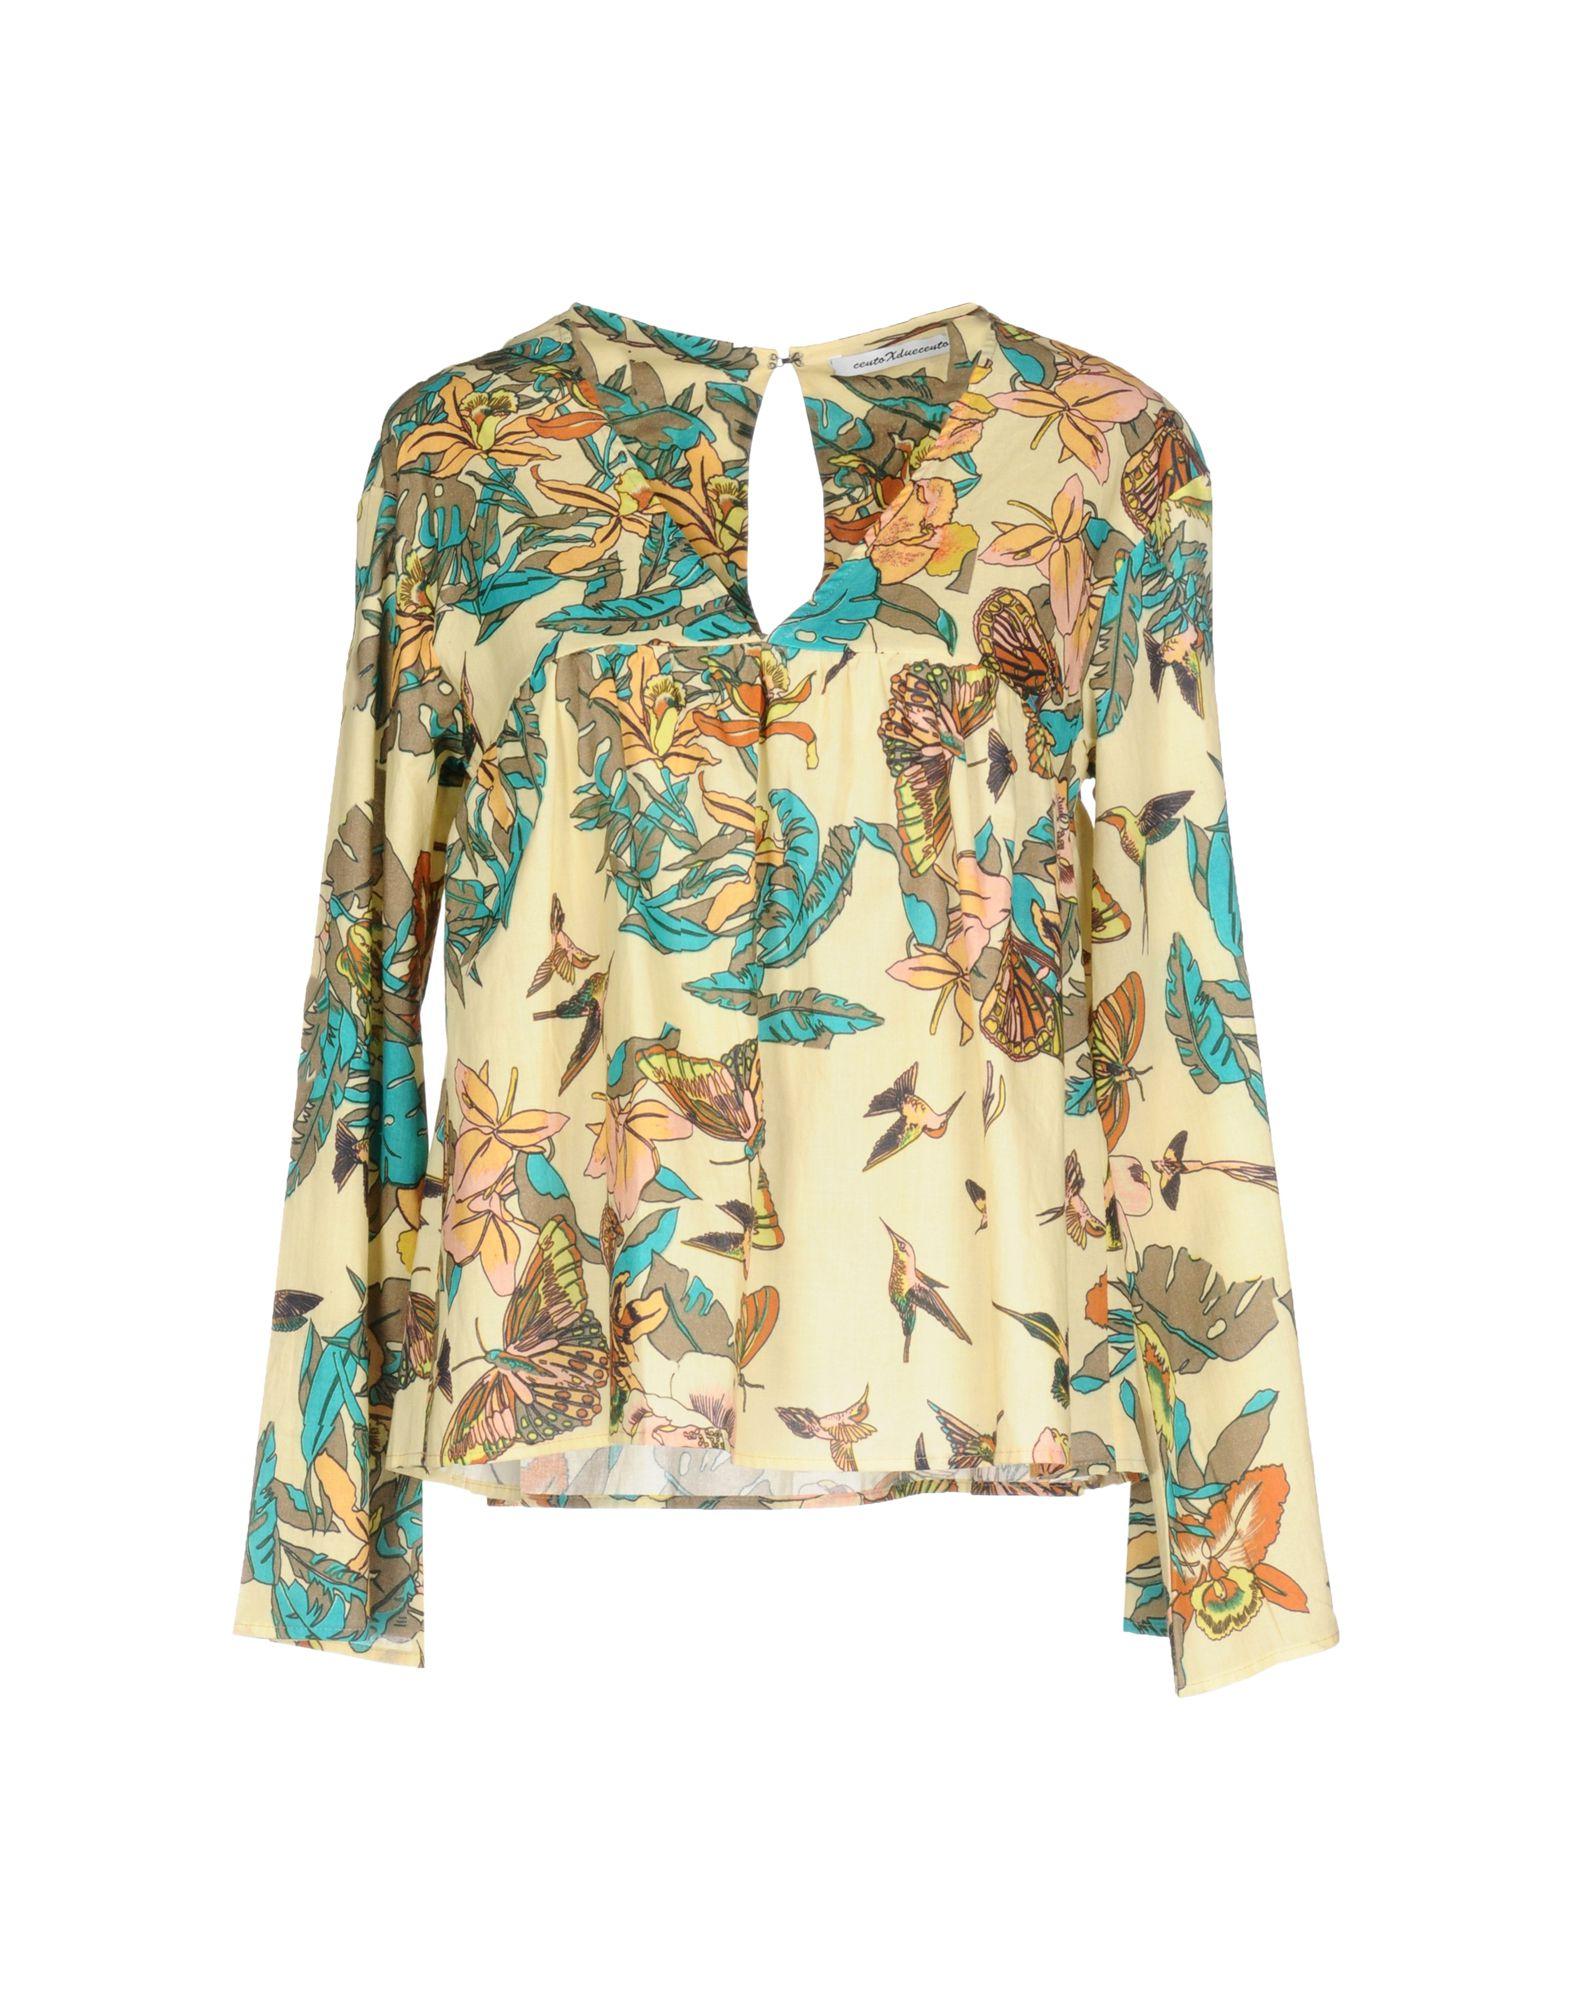 ФОТО 100x200 centoxduecento блузка